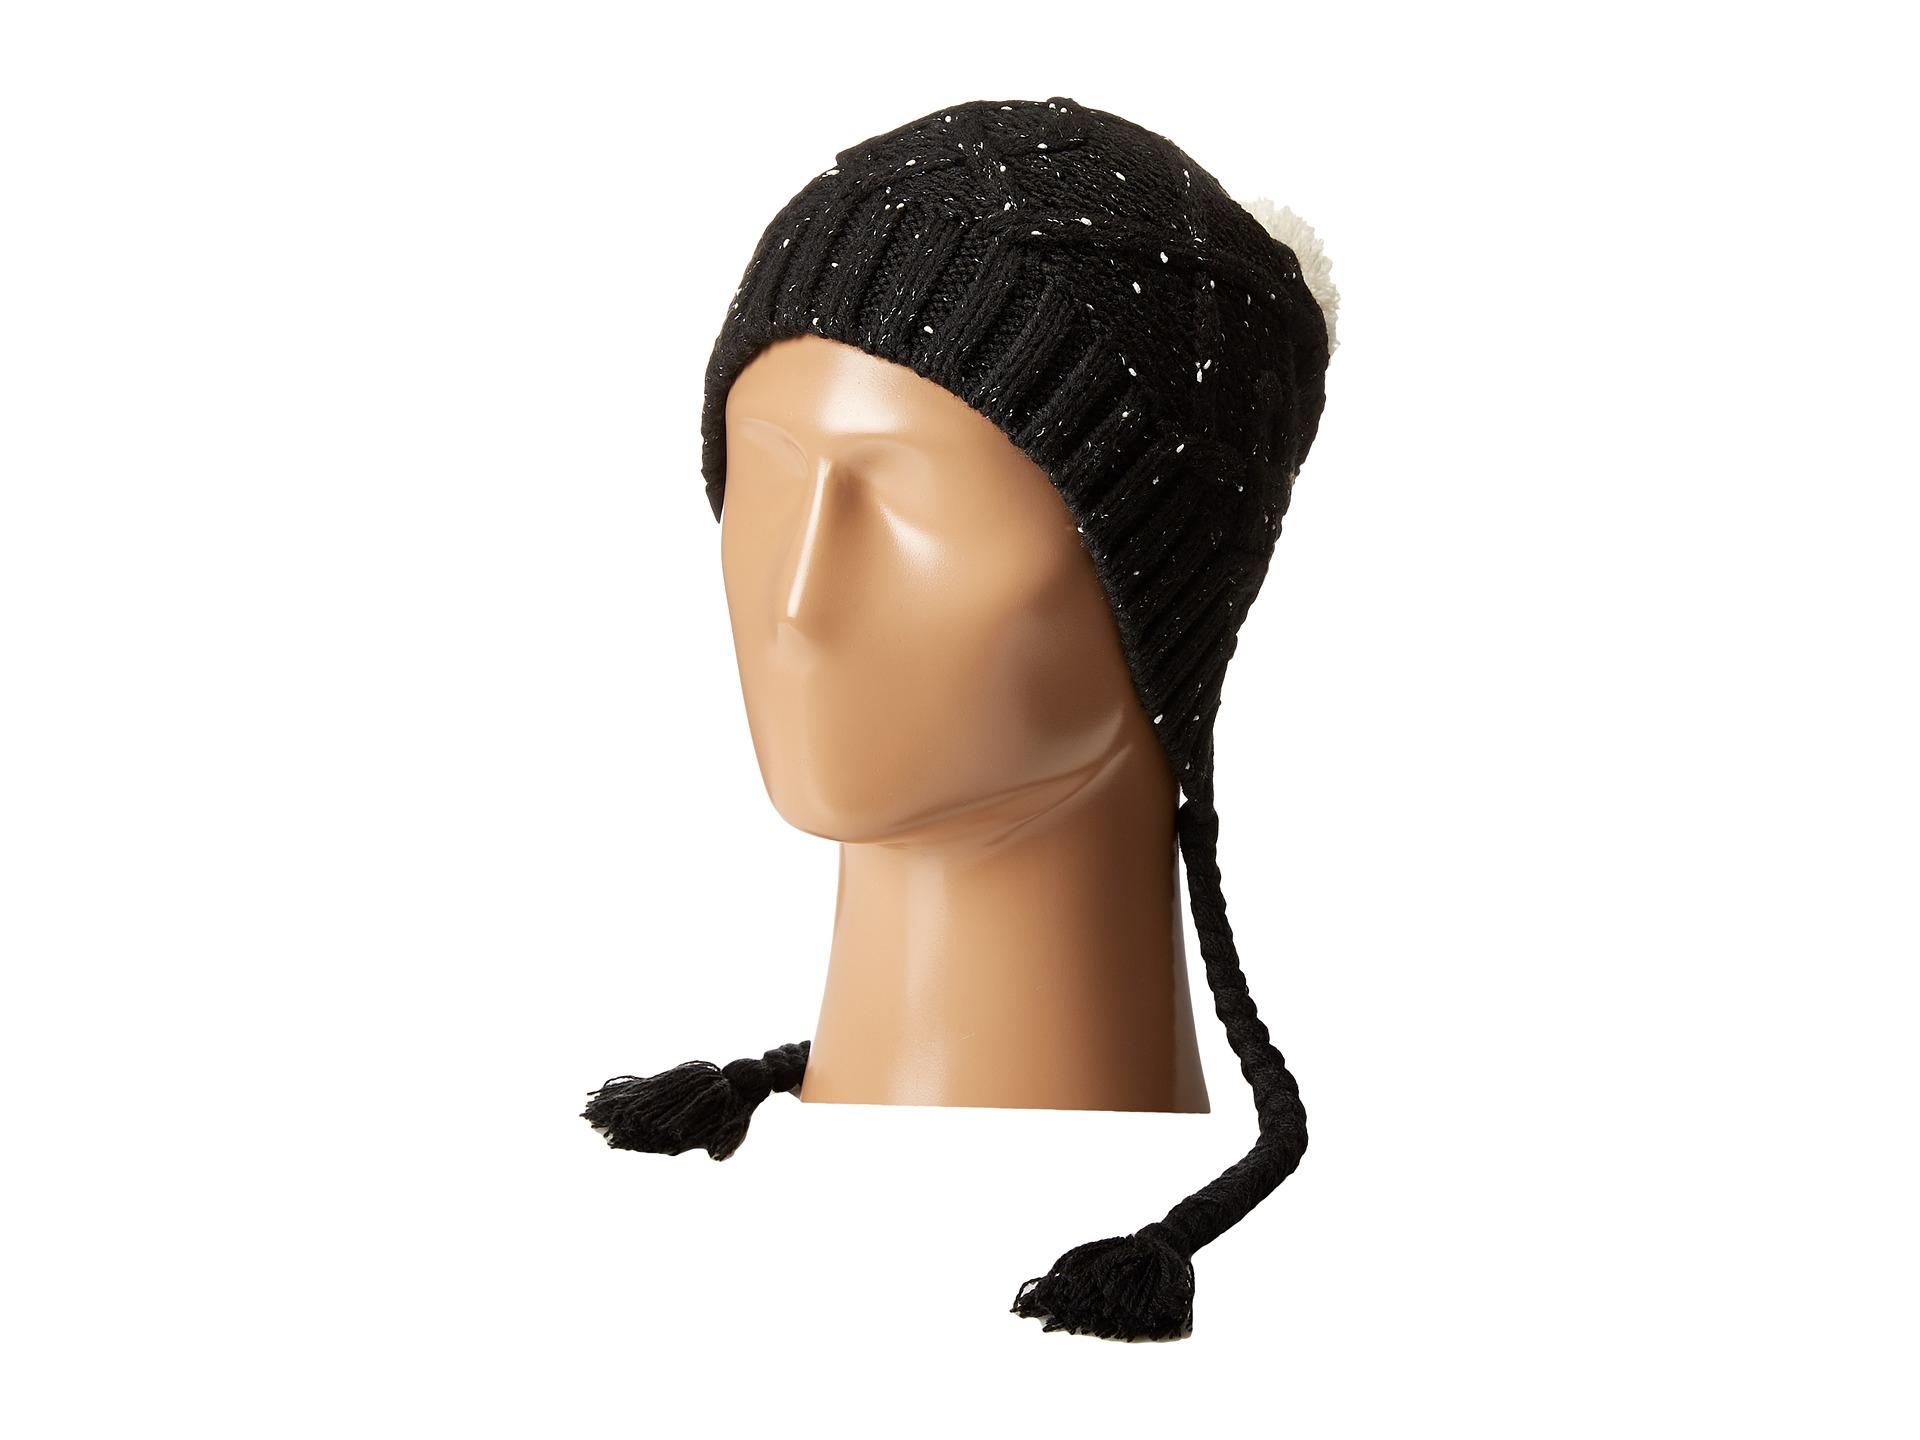 42dc1dd2116 Lyst - The North Face Flecka Earflap Beanie in Black for Men